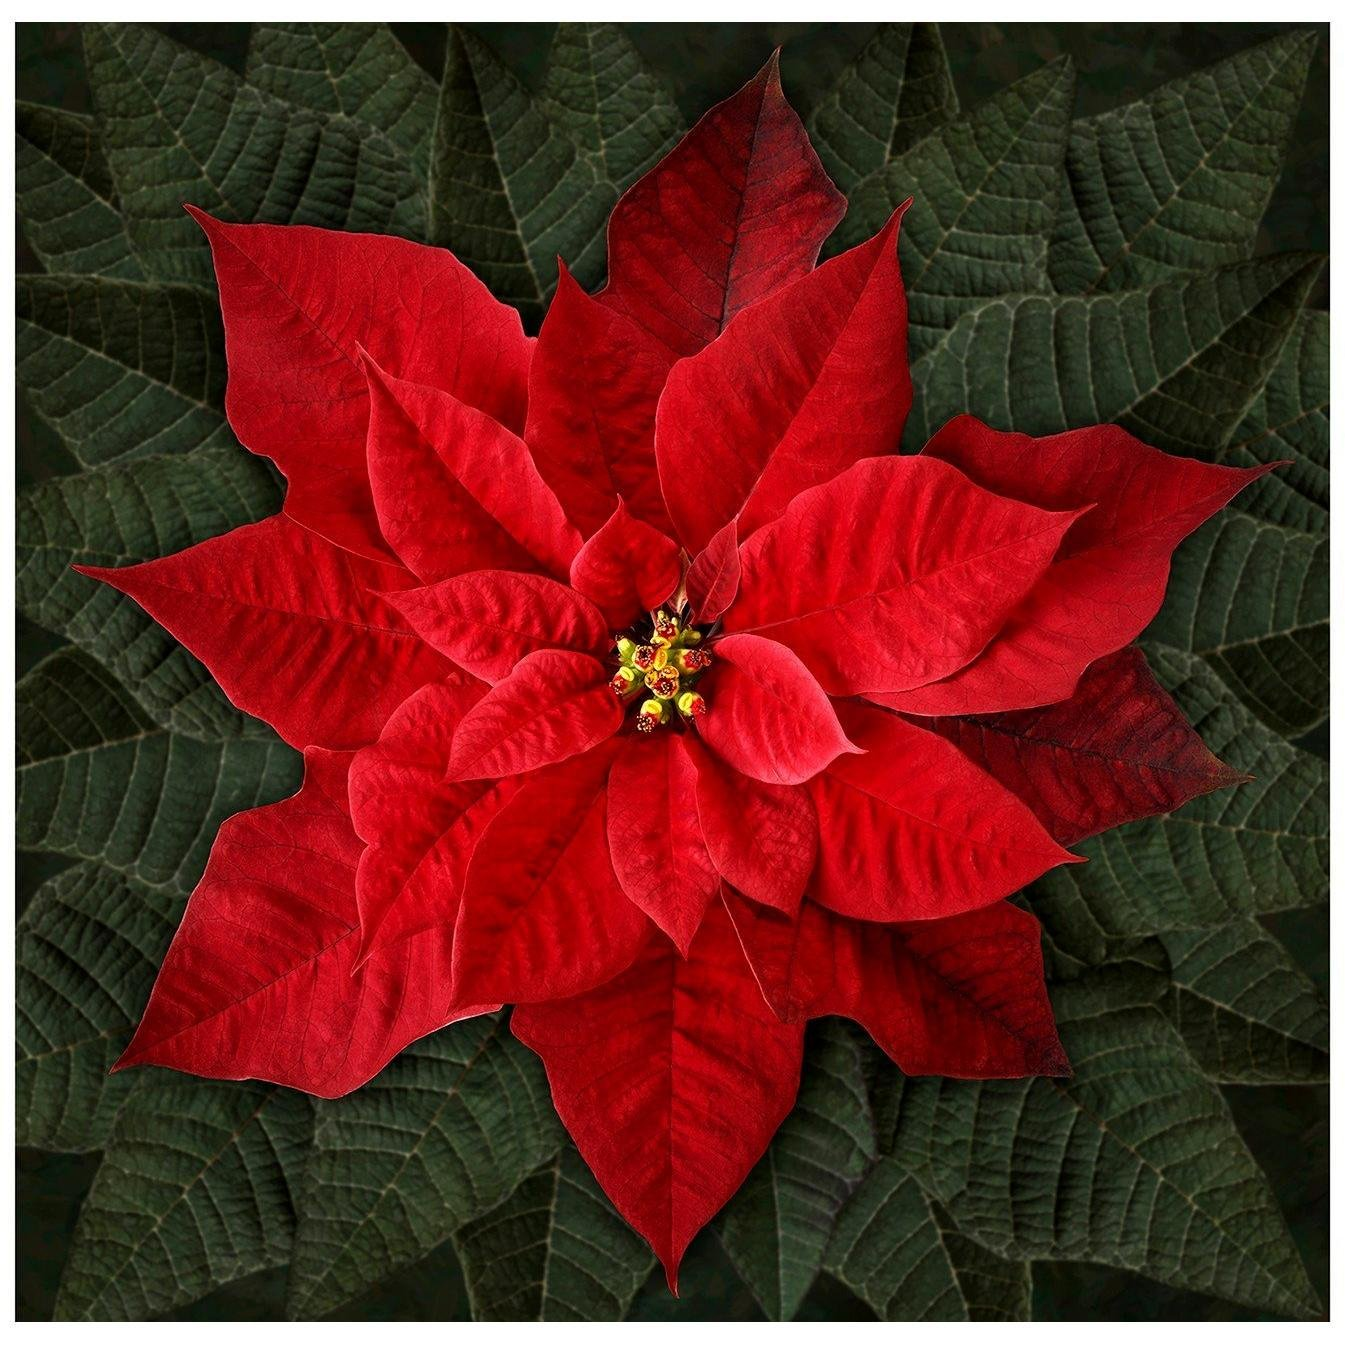 153 - Red Poinsettia panel